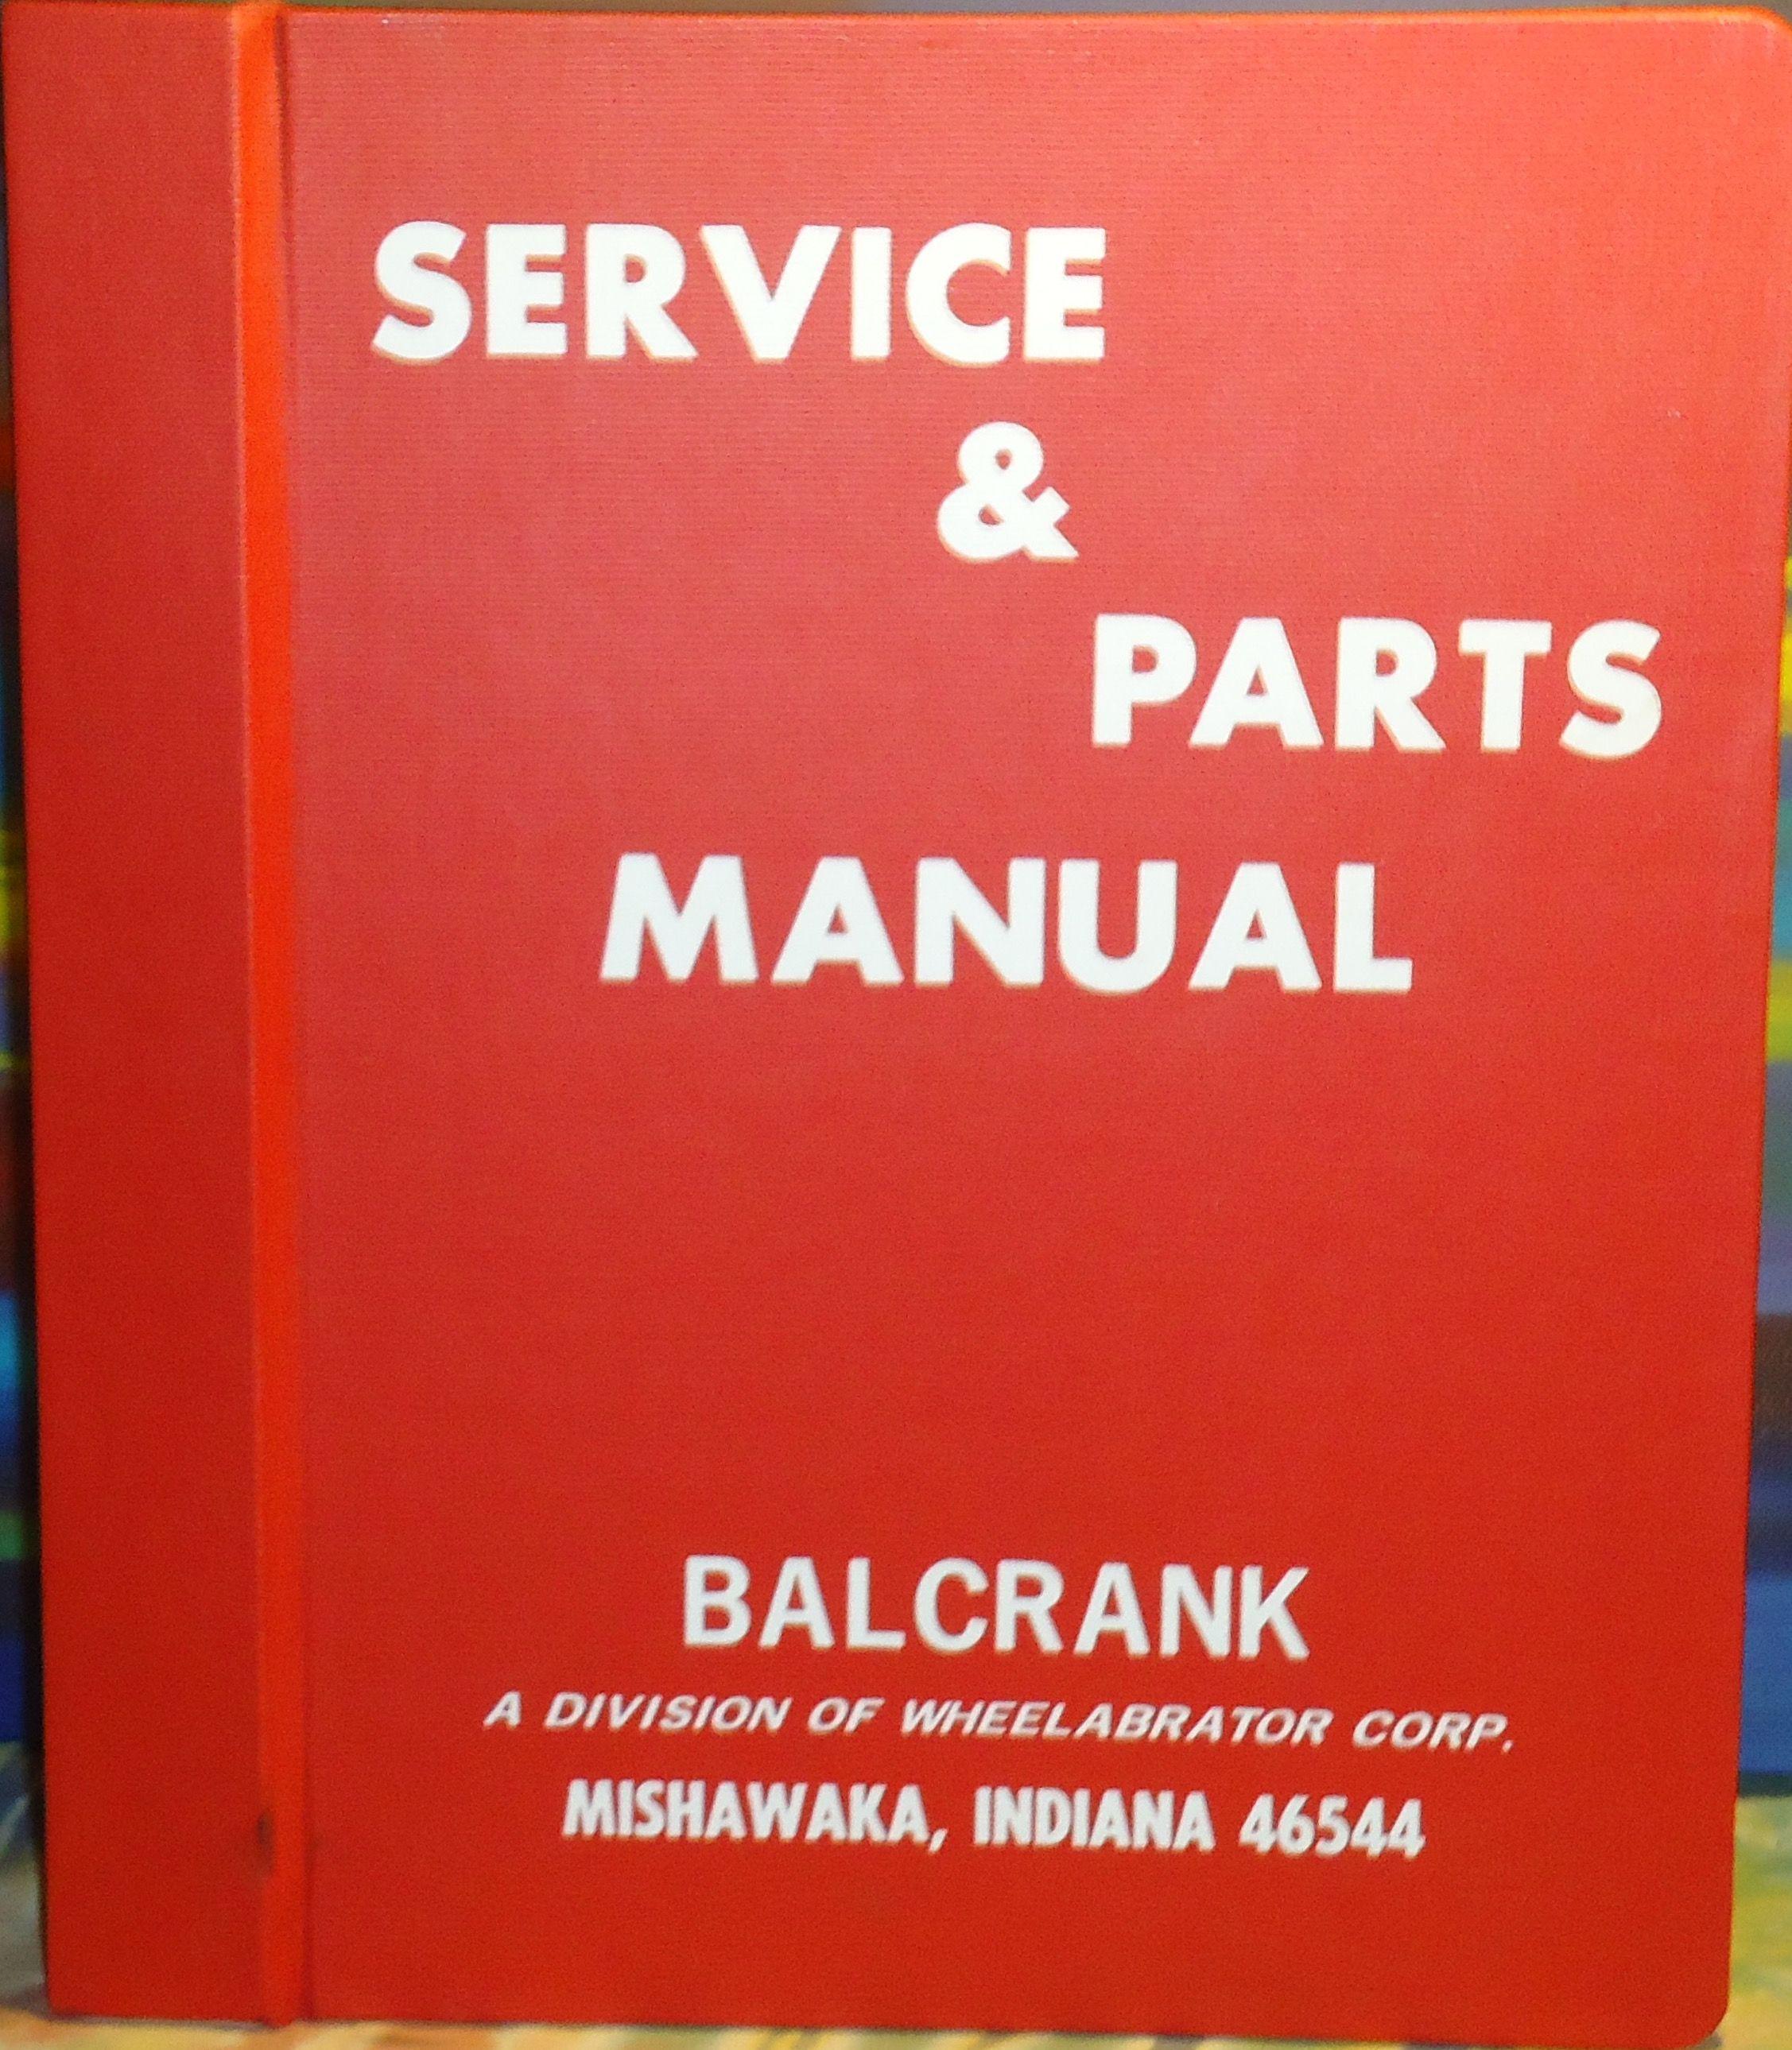 Service & Parts Manual